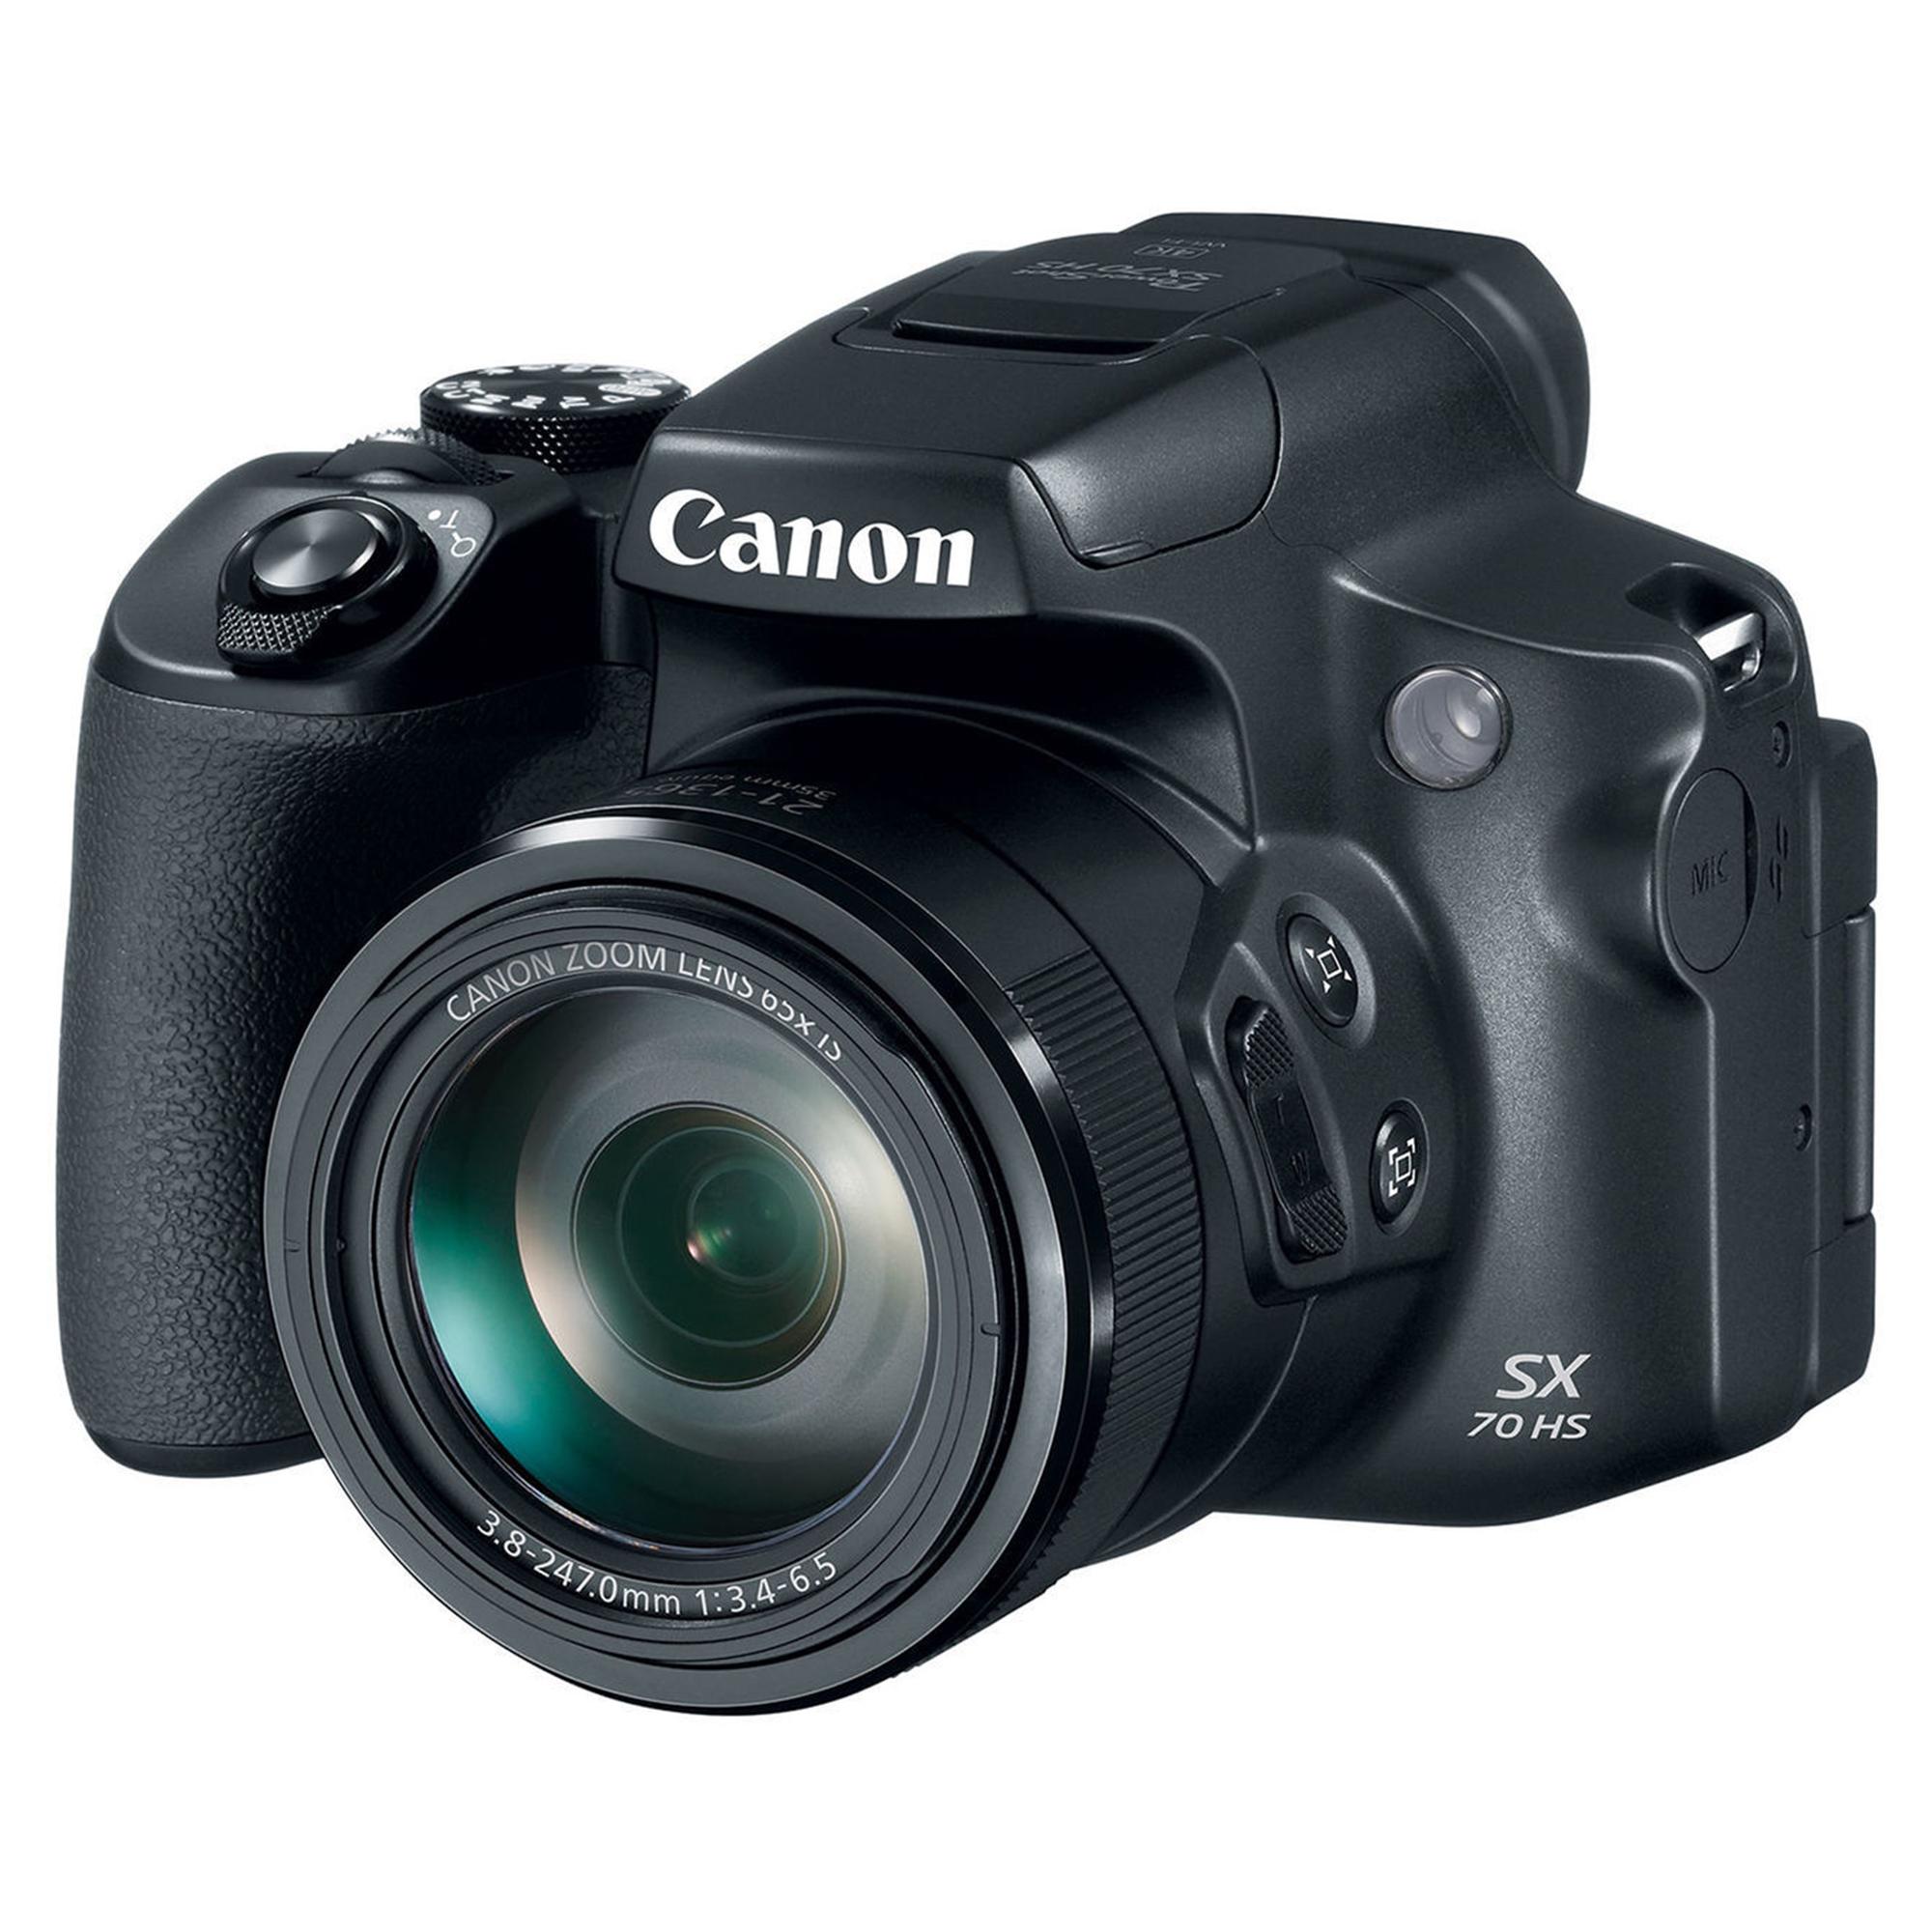 فروش نقدی و اقساطی دوربین دیجیتال کانن مدل Powershot SX70 HS